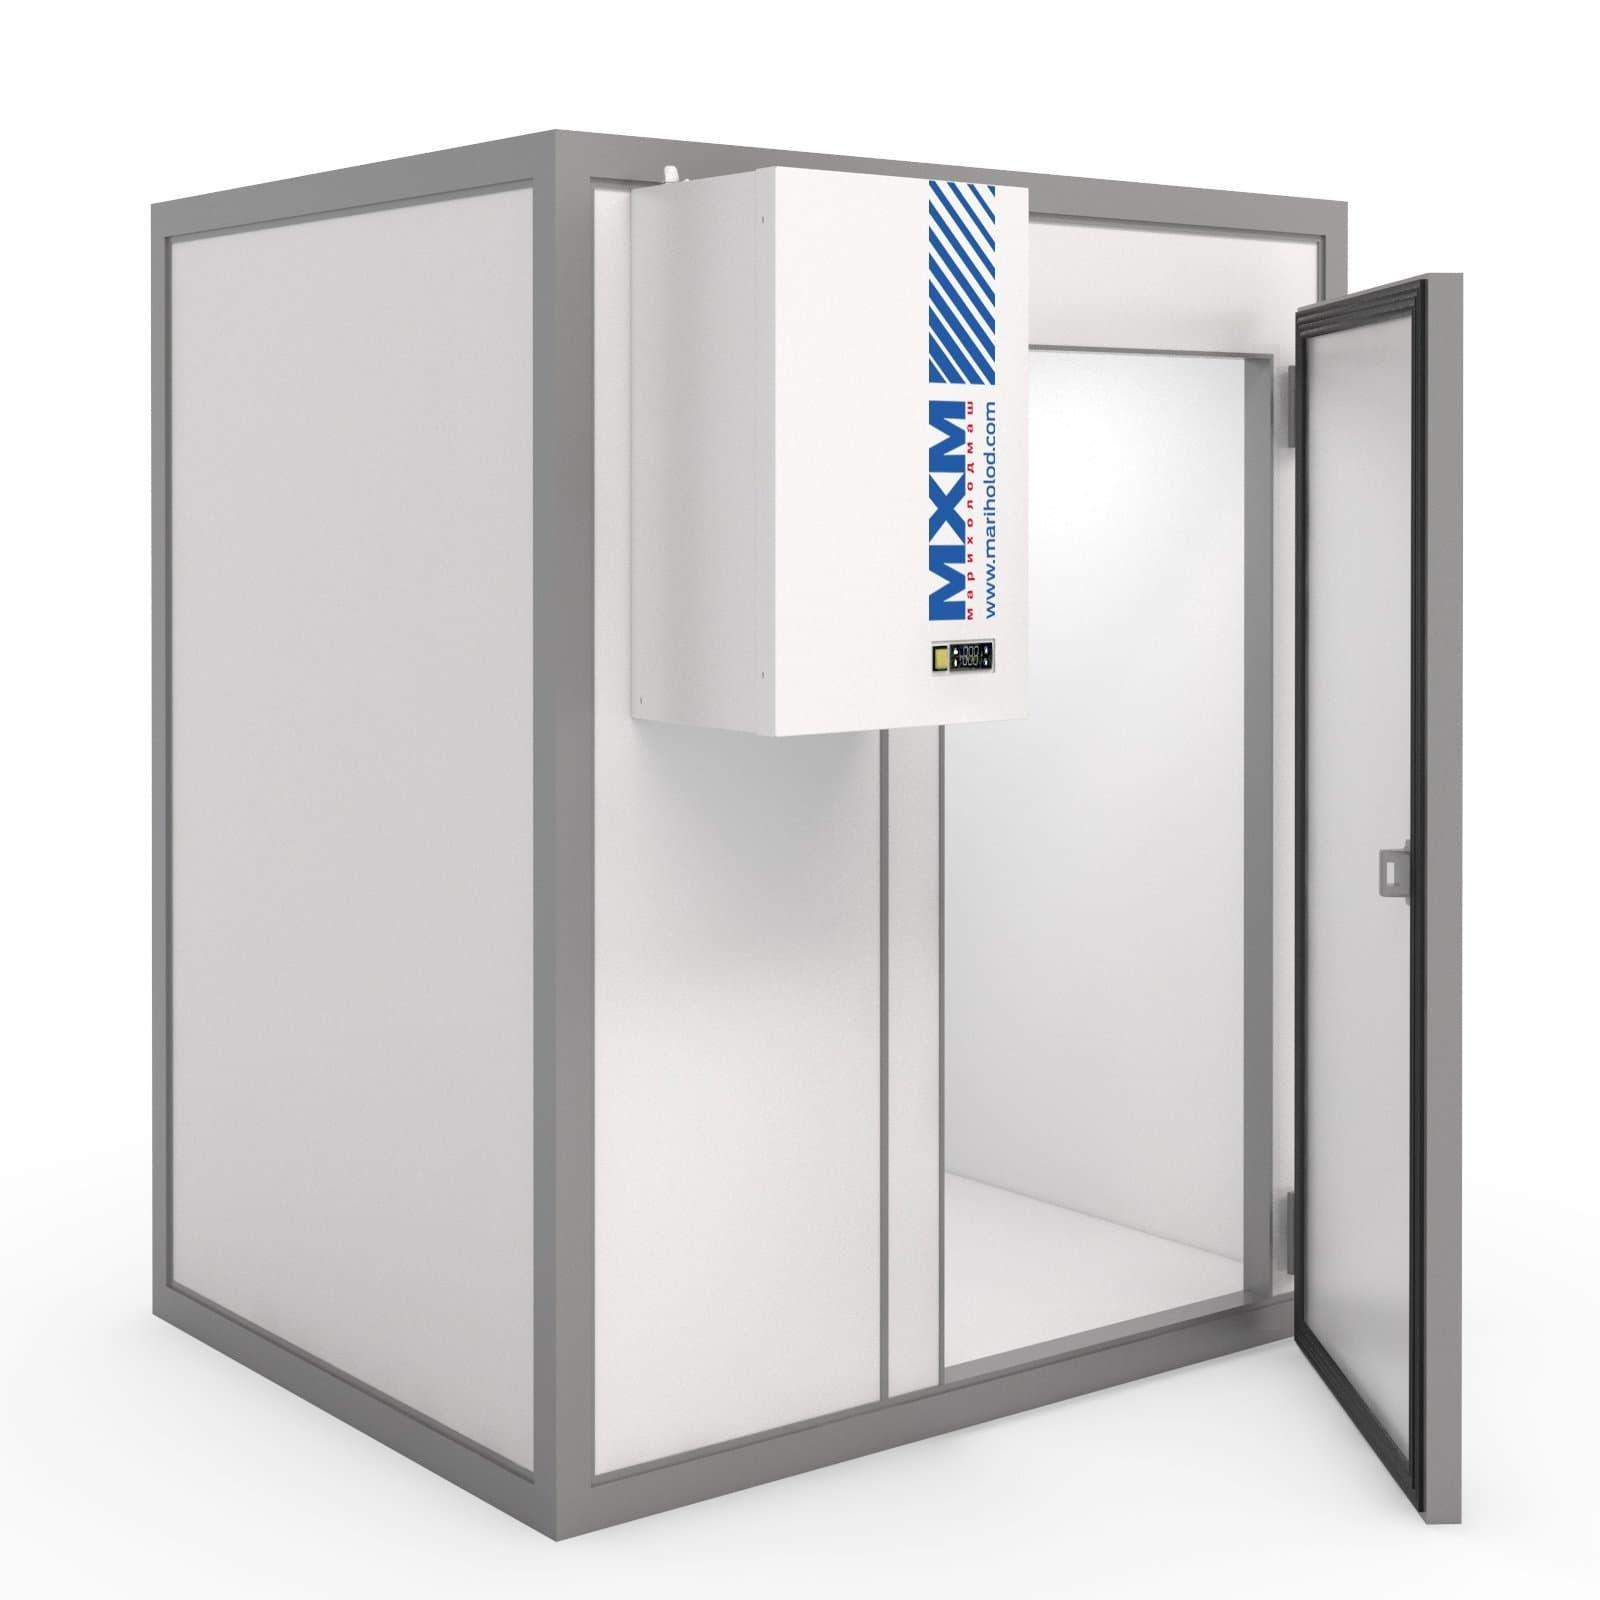 Камера холодильная МХМ КХН-13,77 1660×4660×2200